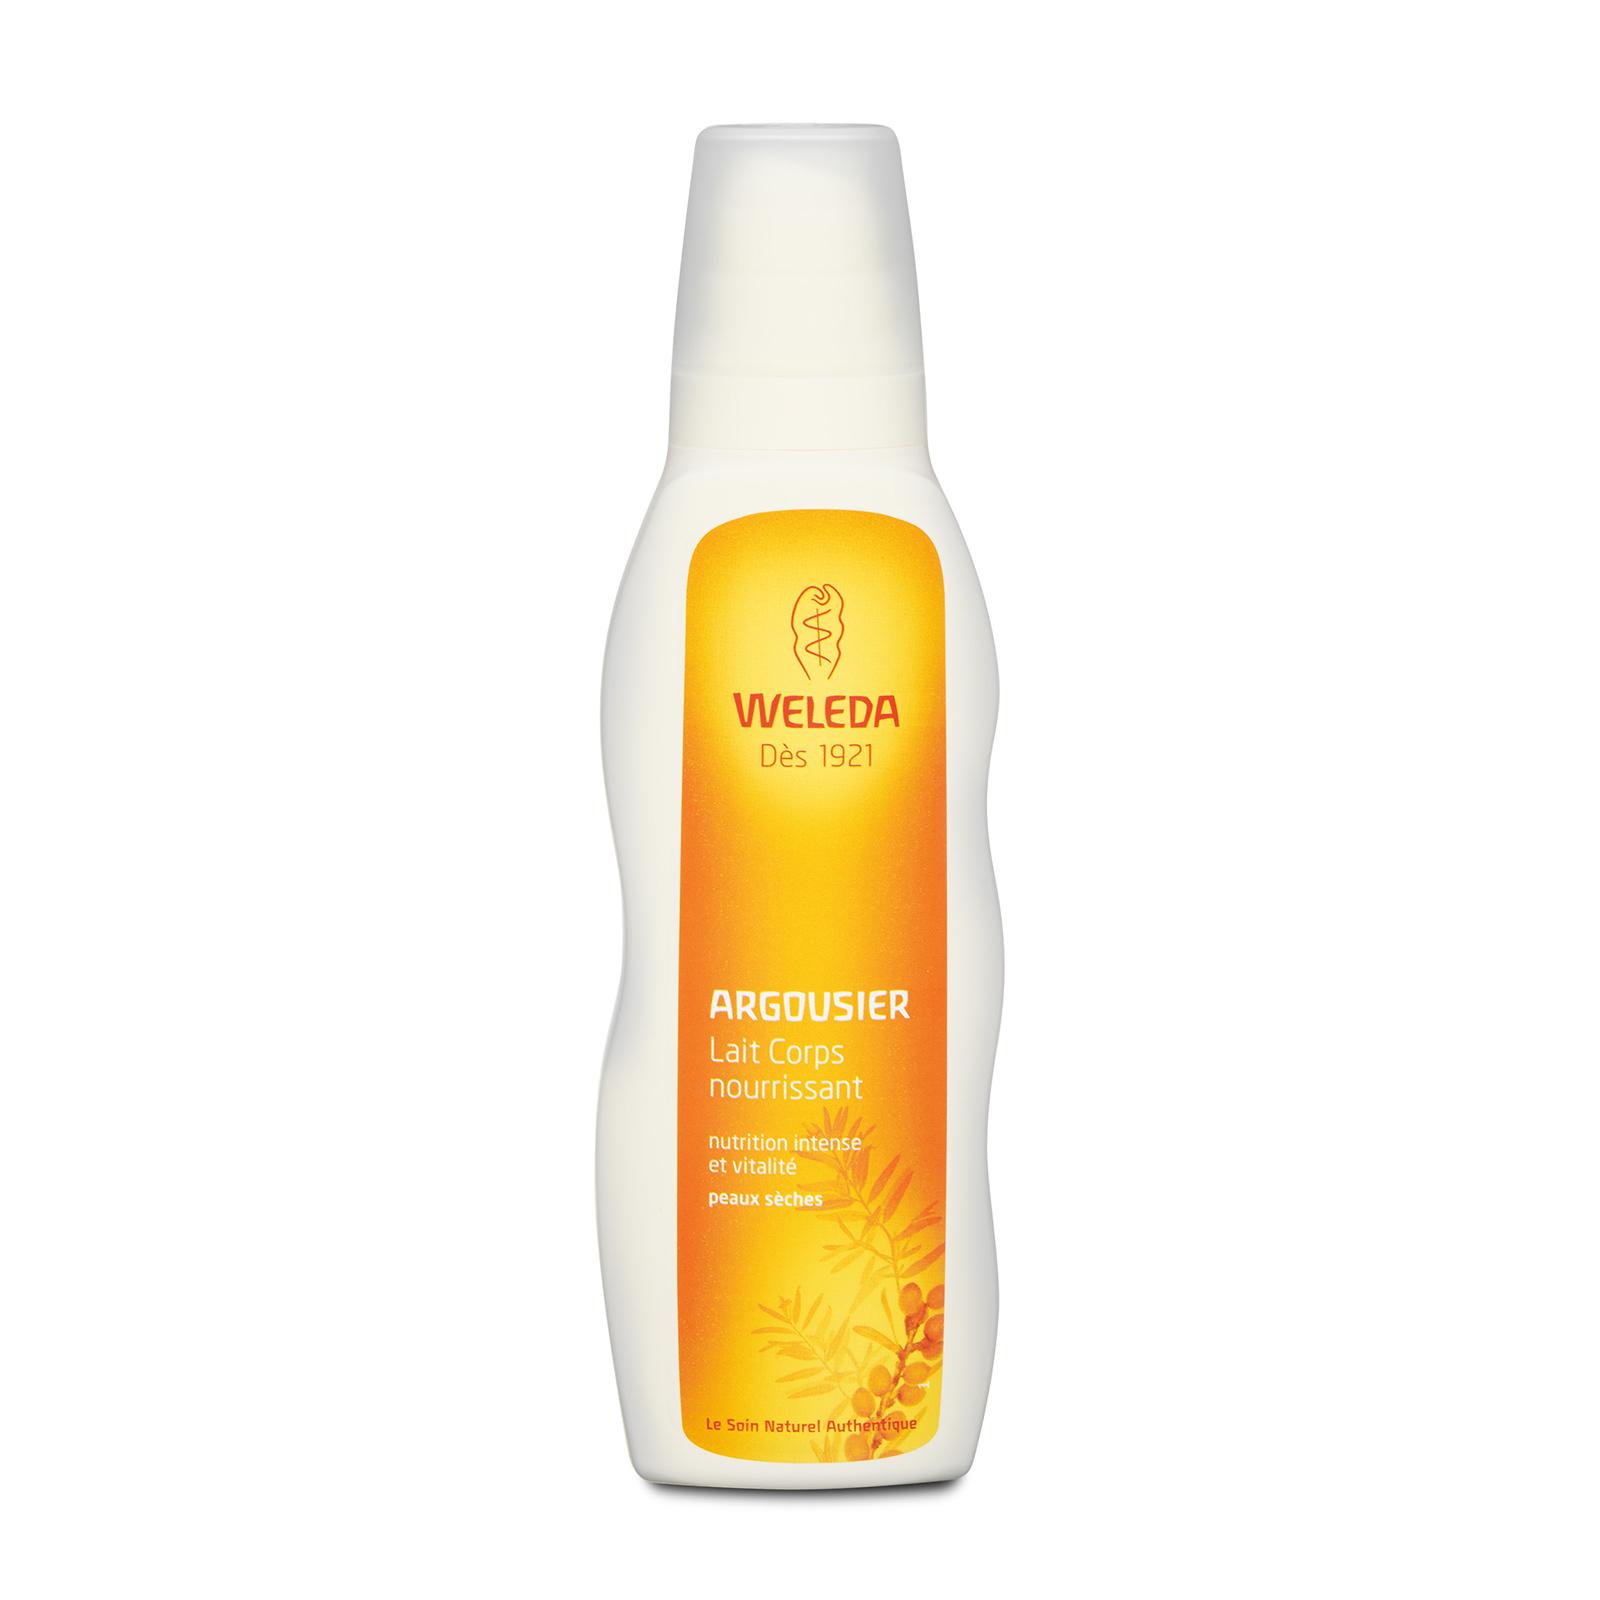 Weleda  Sea Buckthorn Nourishing Body Lotion (For Dry Skin) 6.8oz, 200ml from Cosme-De.com